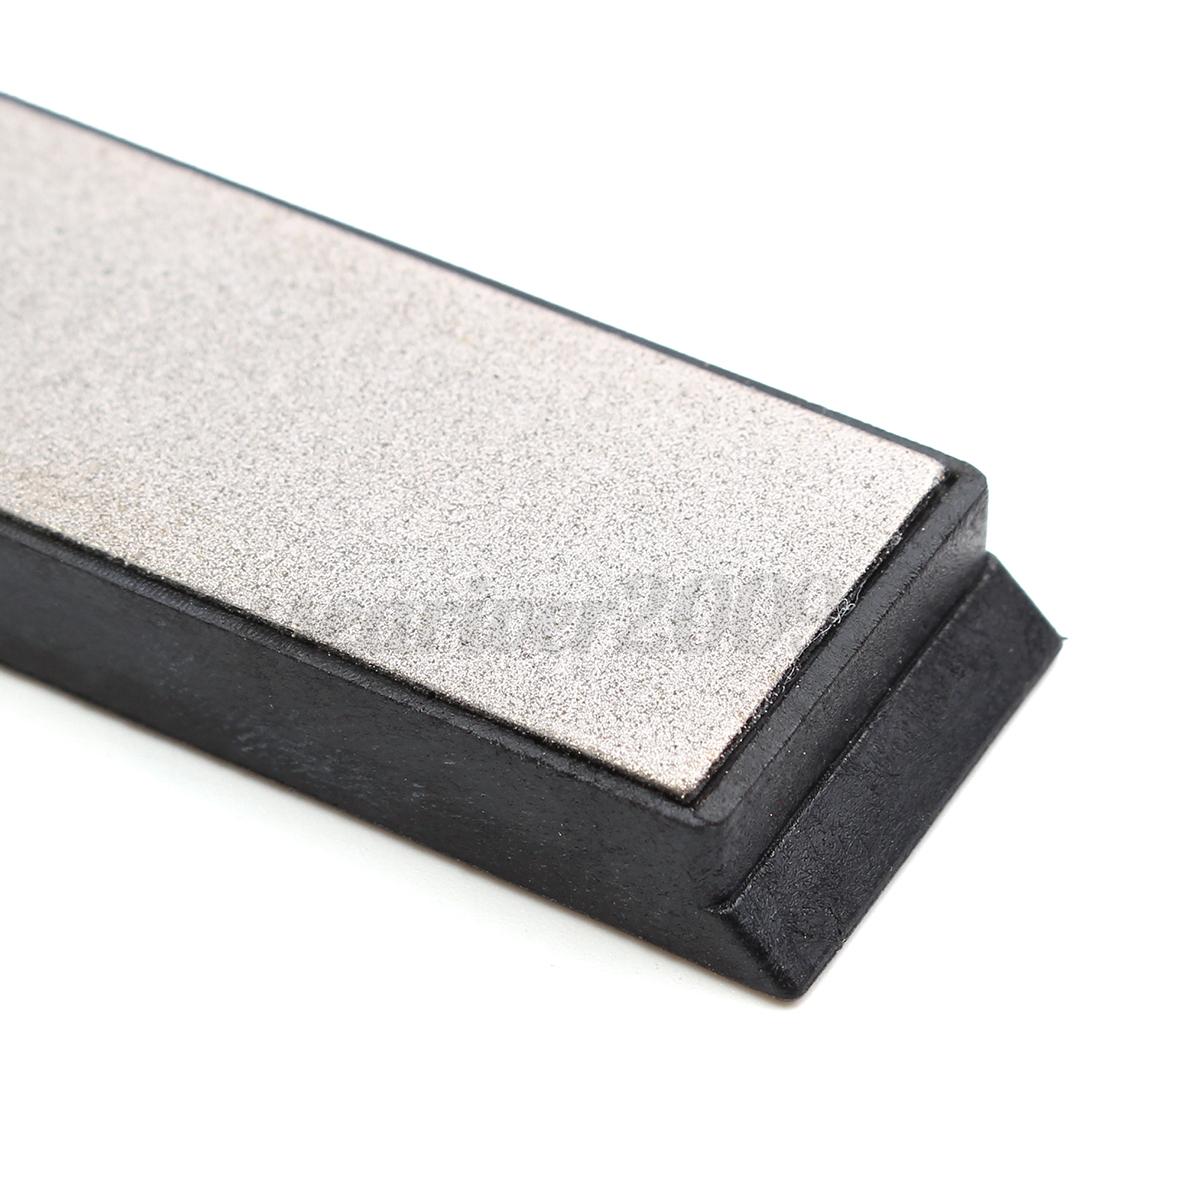 kitchen knife sharpener sharpening stone diamond whetstone edge pro various grit ebay. Black Bedroom Furniture Sets. Home Design Ideas